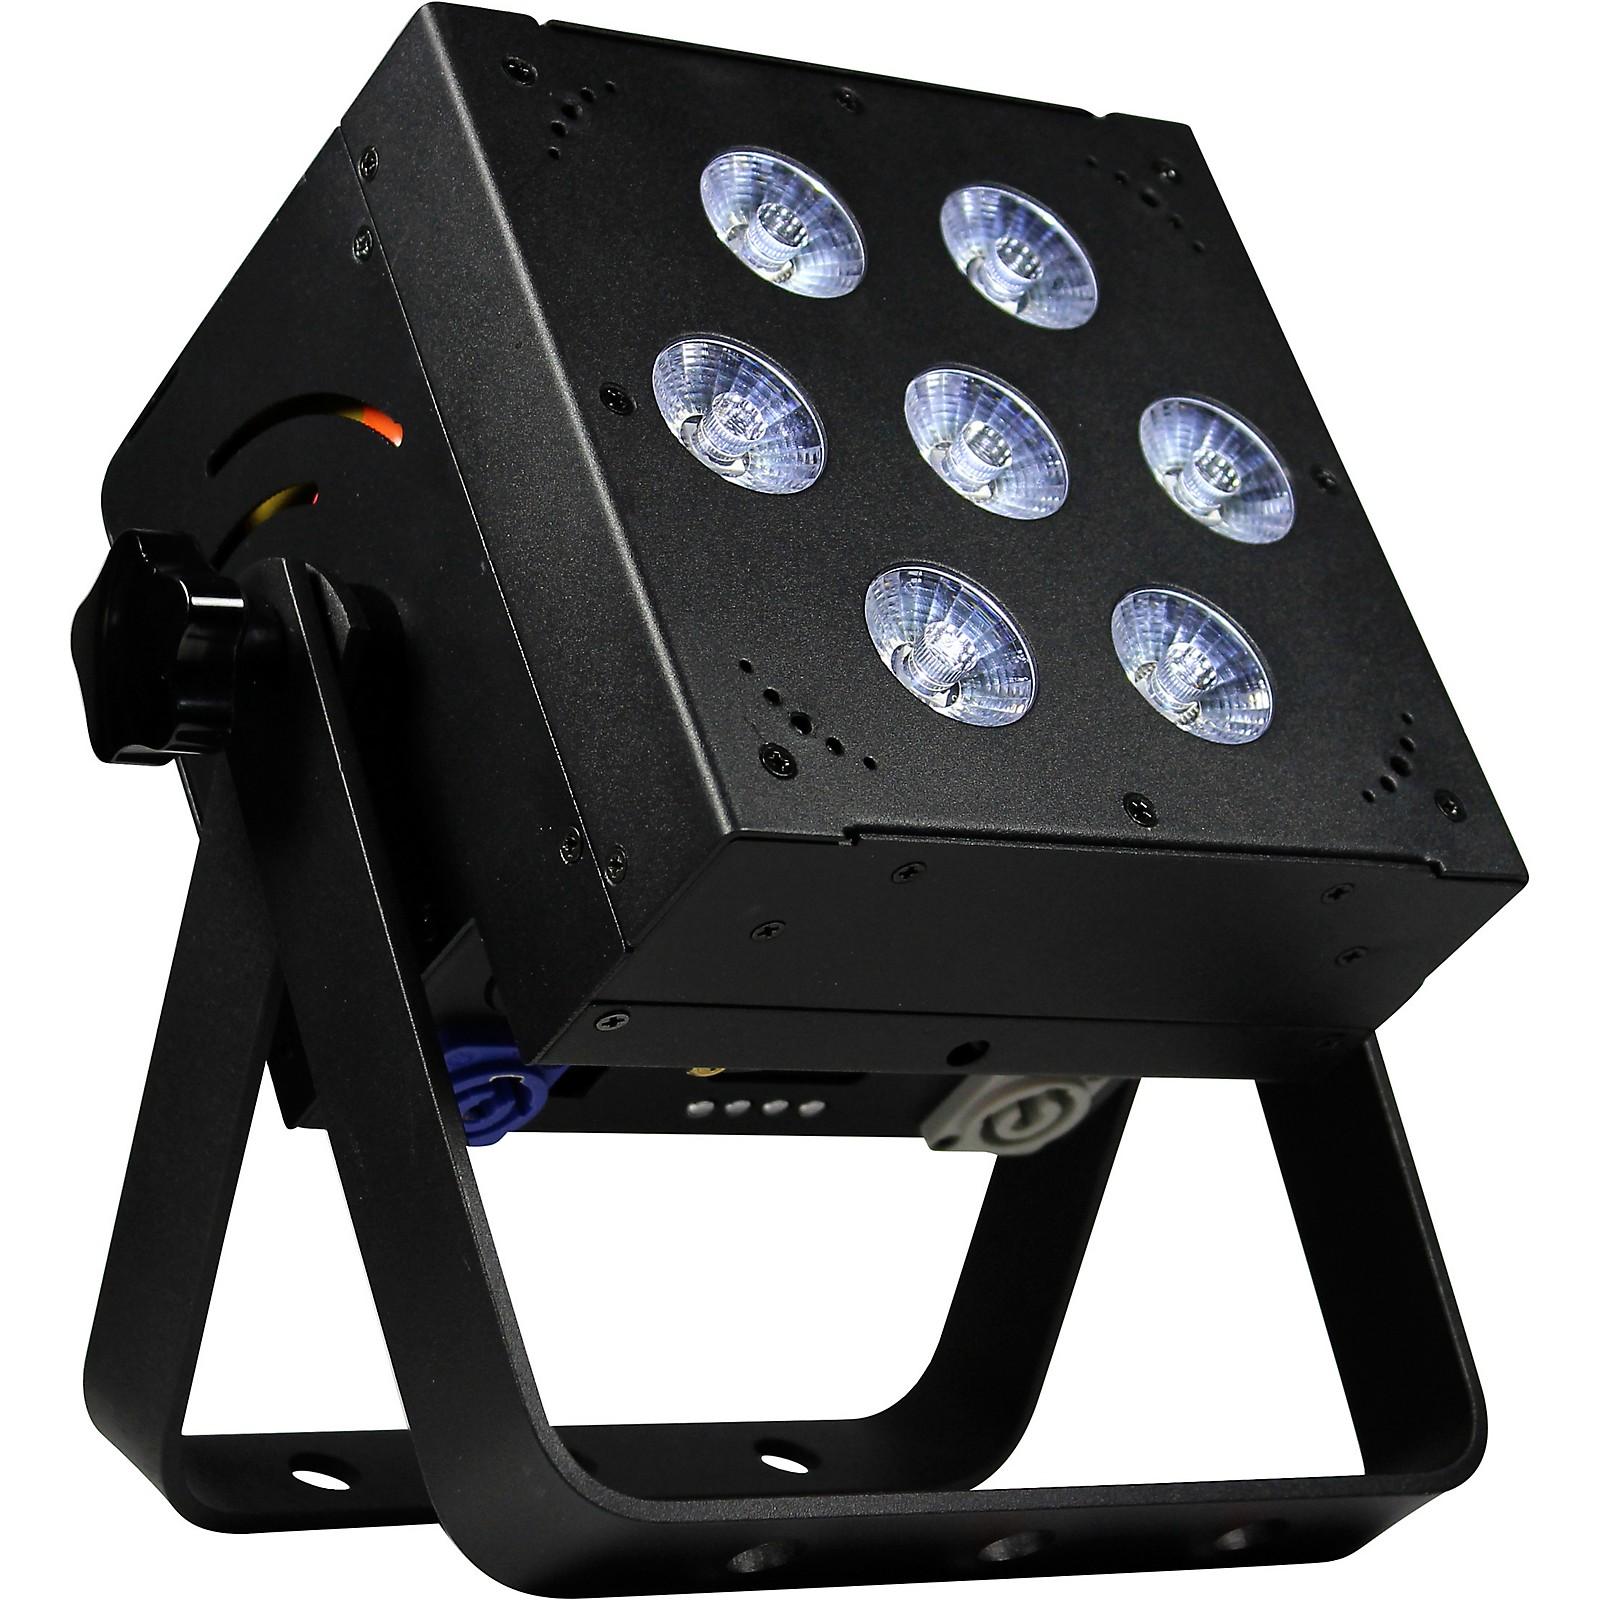 Blizzard SkyBox W-DMX RGBAW+UV LED Rechargeable Battery Powered 2.4MHz Wireless DMX Wash Light